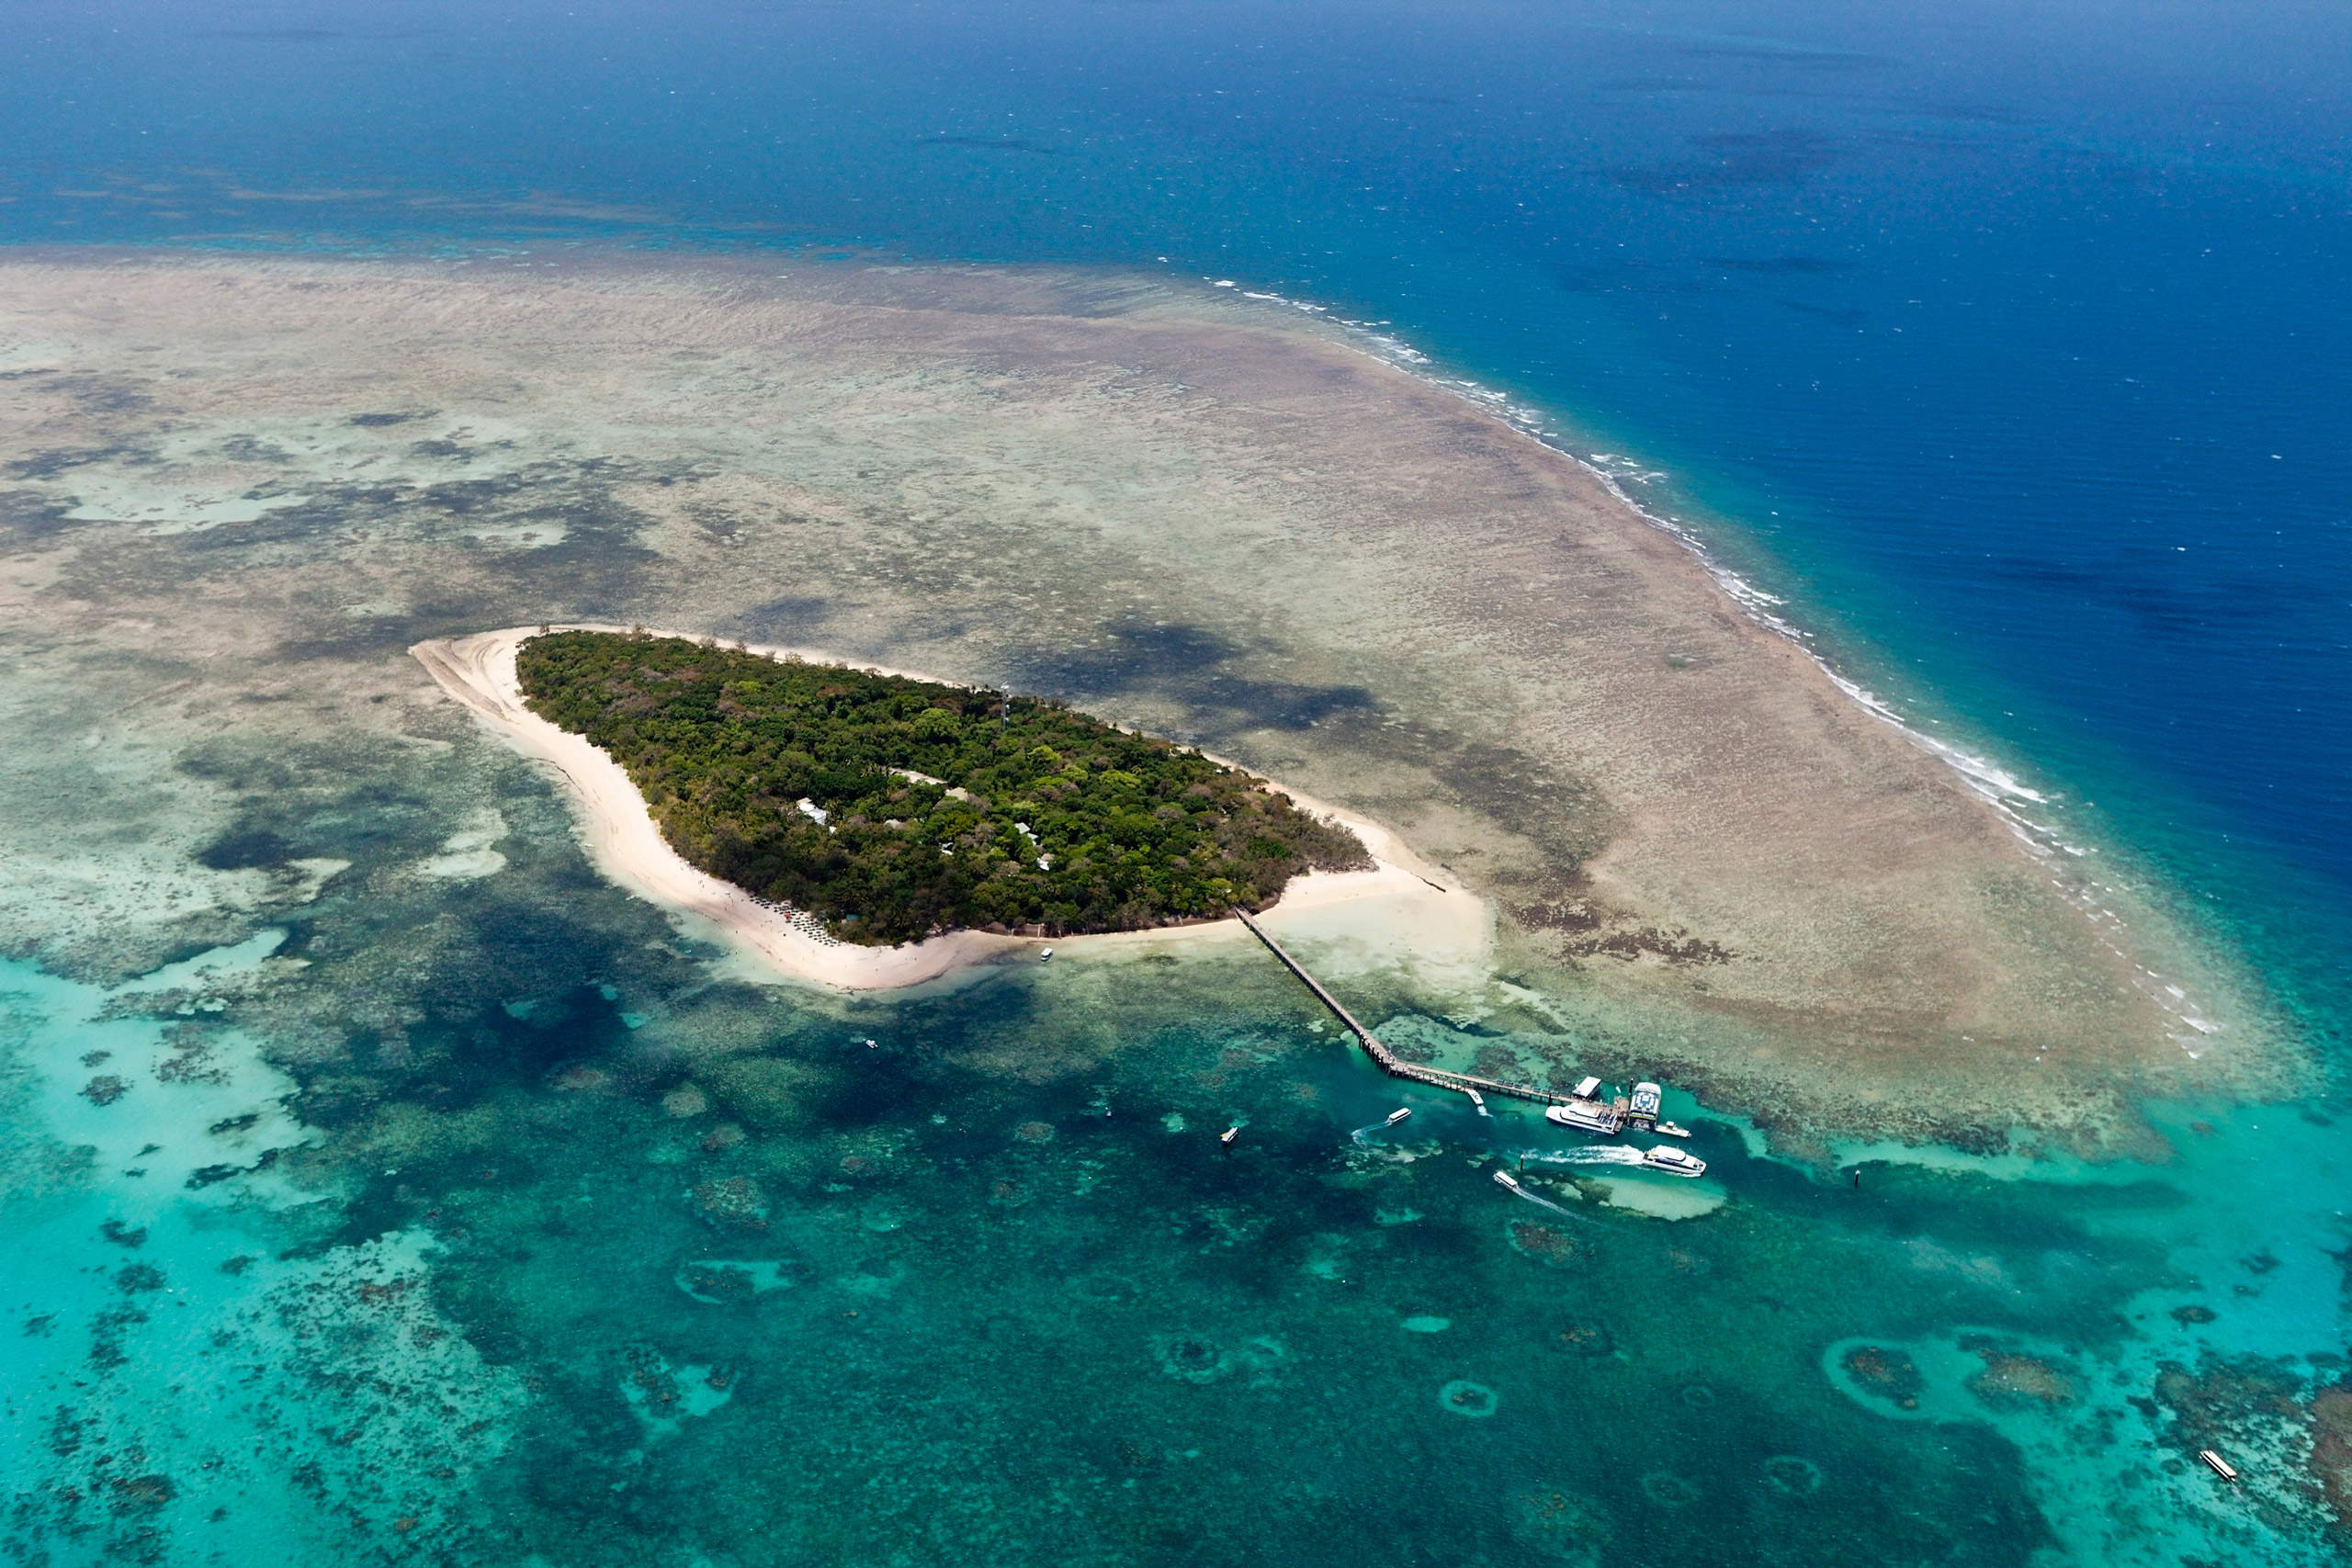 20 Apr 2015, Green Island, Great Barrier Reef Marine Park, Australia --- Aerial View of Green Island, Great Barrier Reef, Queensland, Australia --- Image by © Reinhard Dirscherl/Corbis